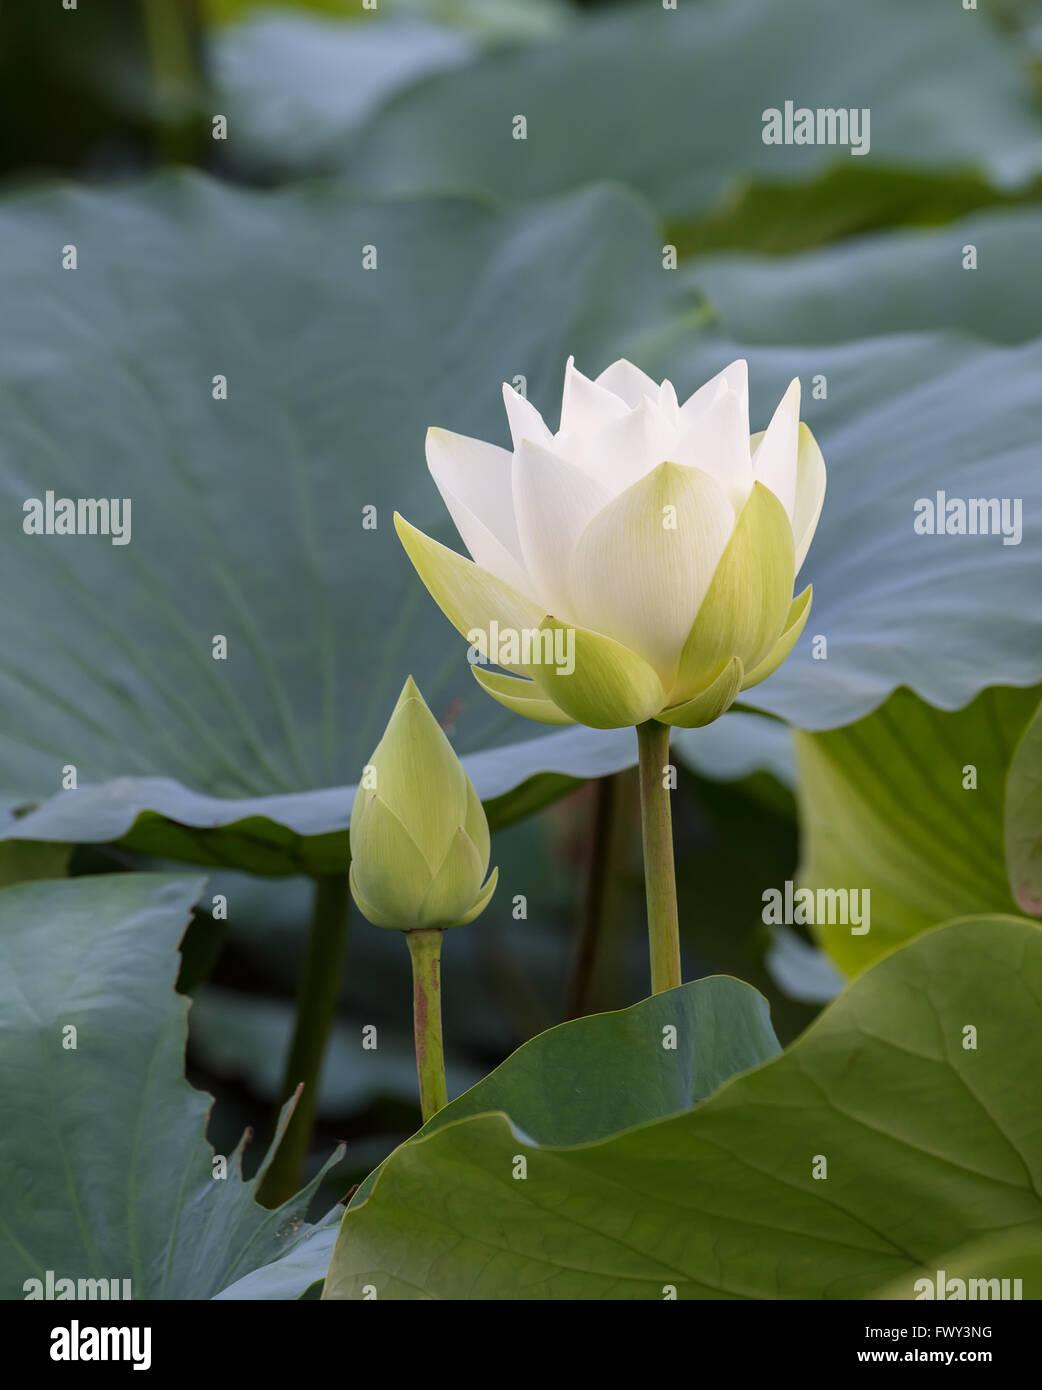 Lotus Flower And Lotus Flower Plants Stock Photo 102013900 Alamy